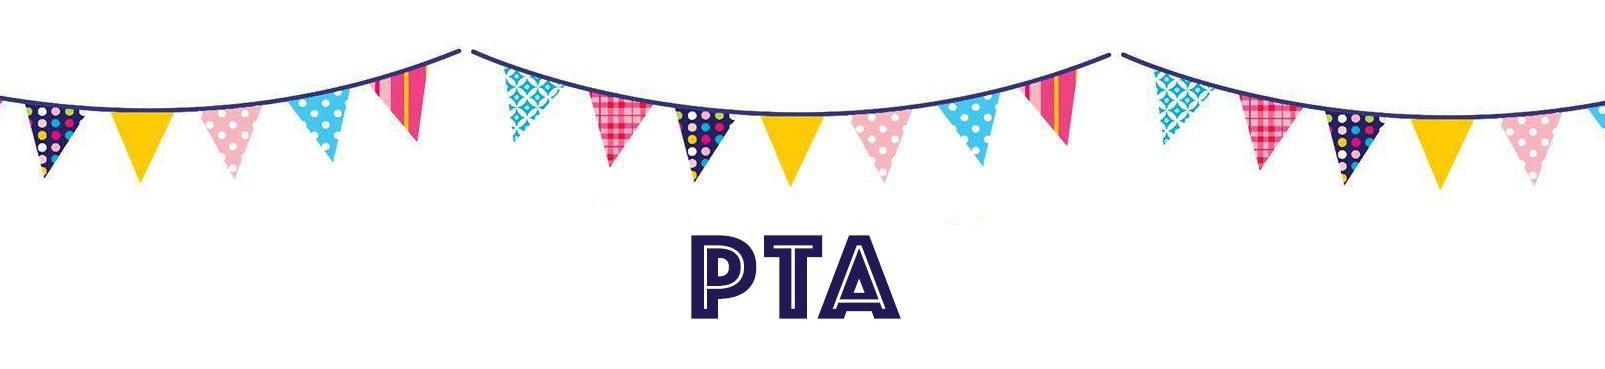 Banner PTA